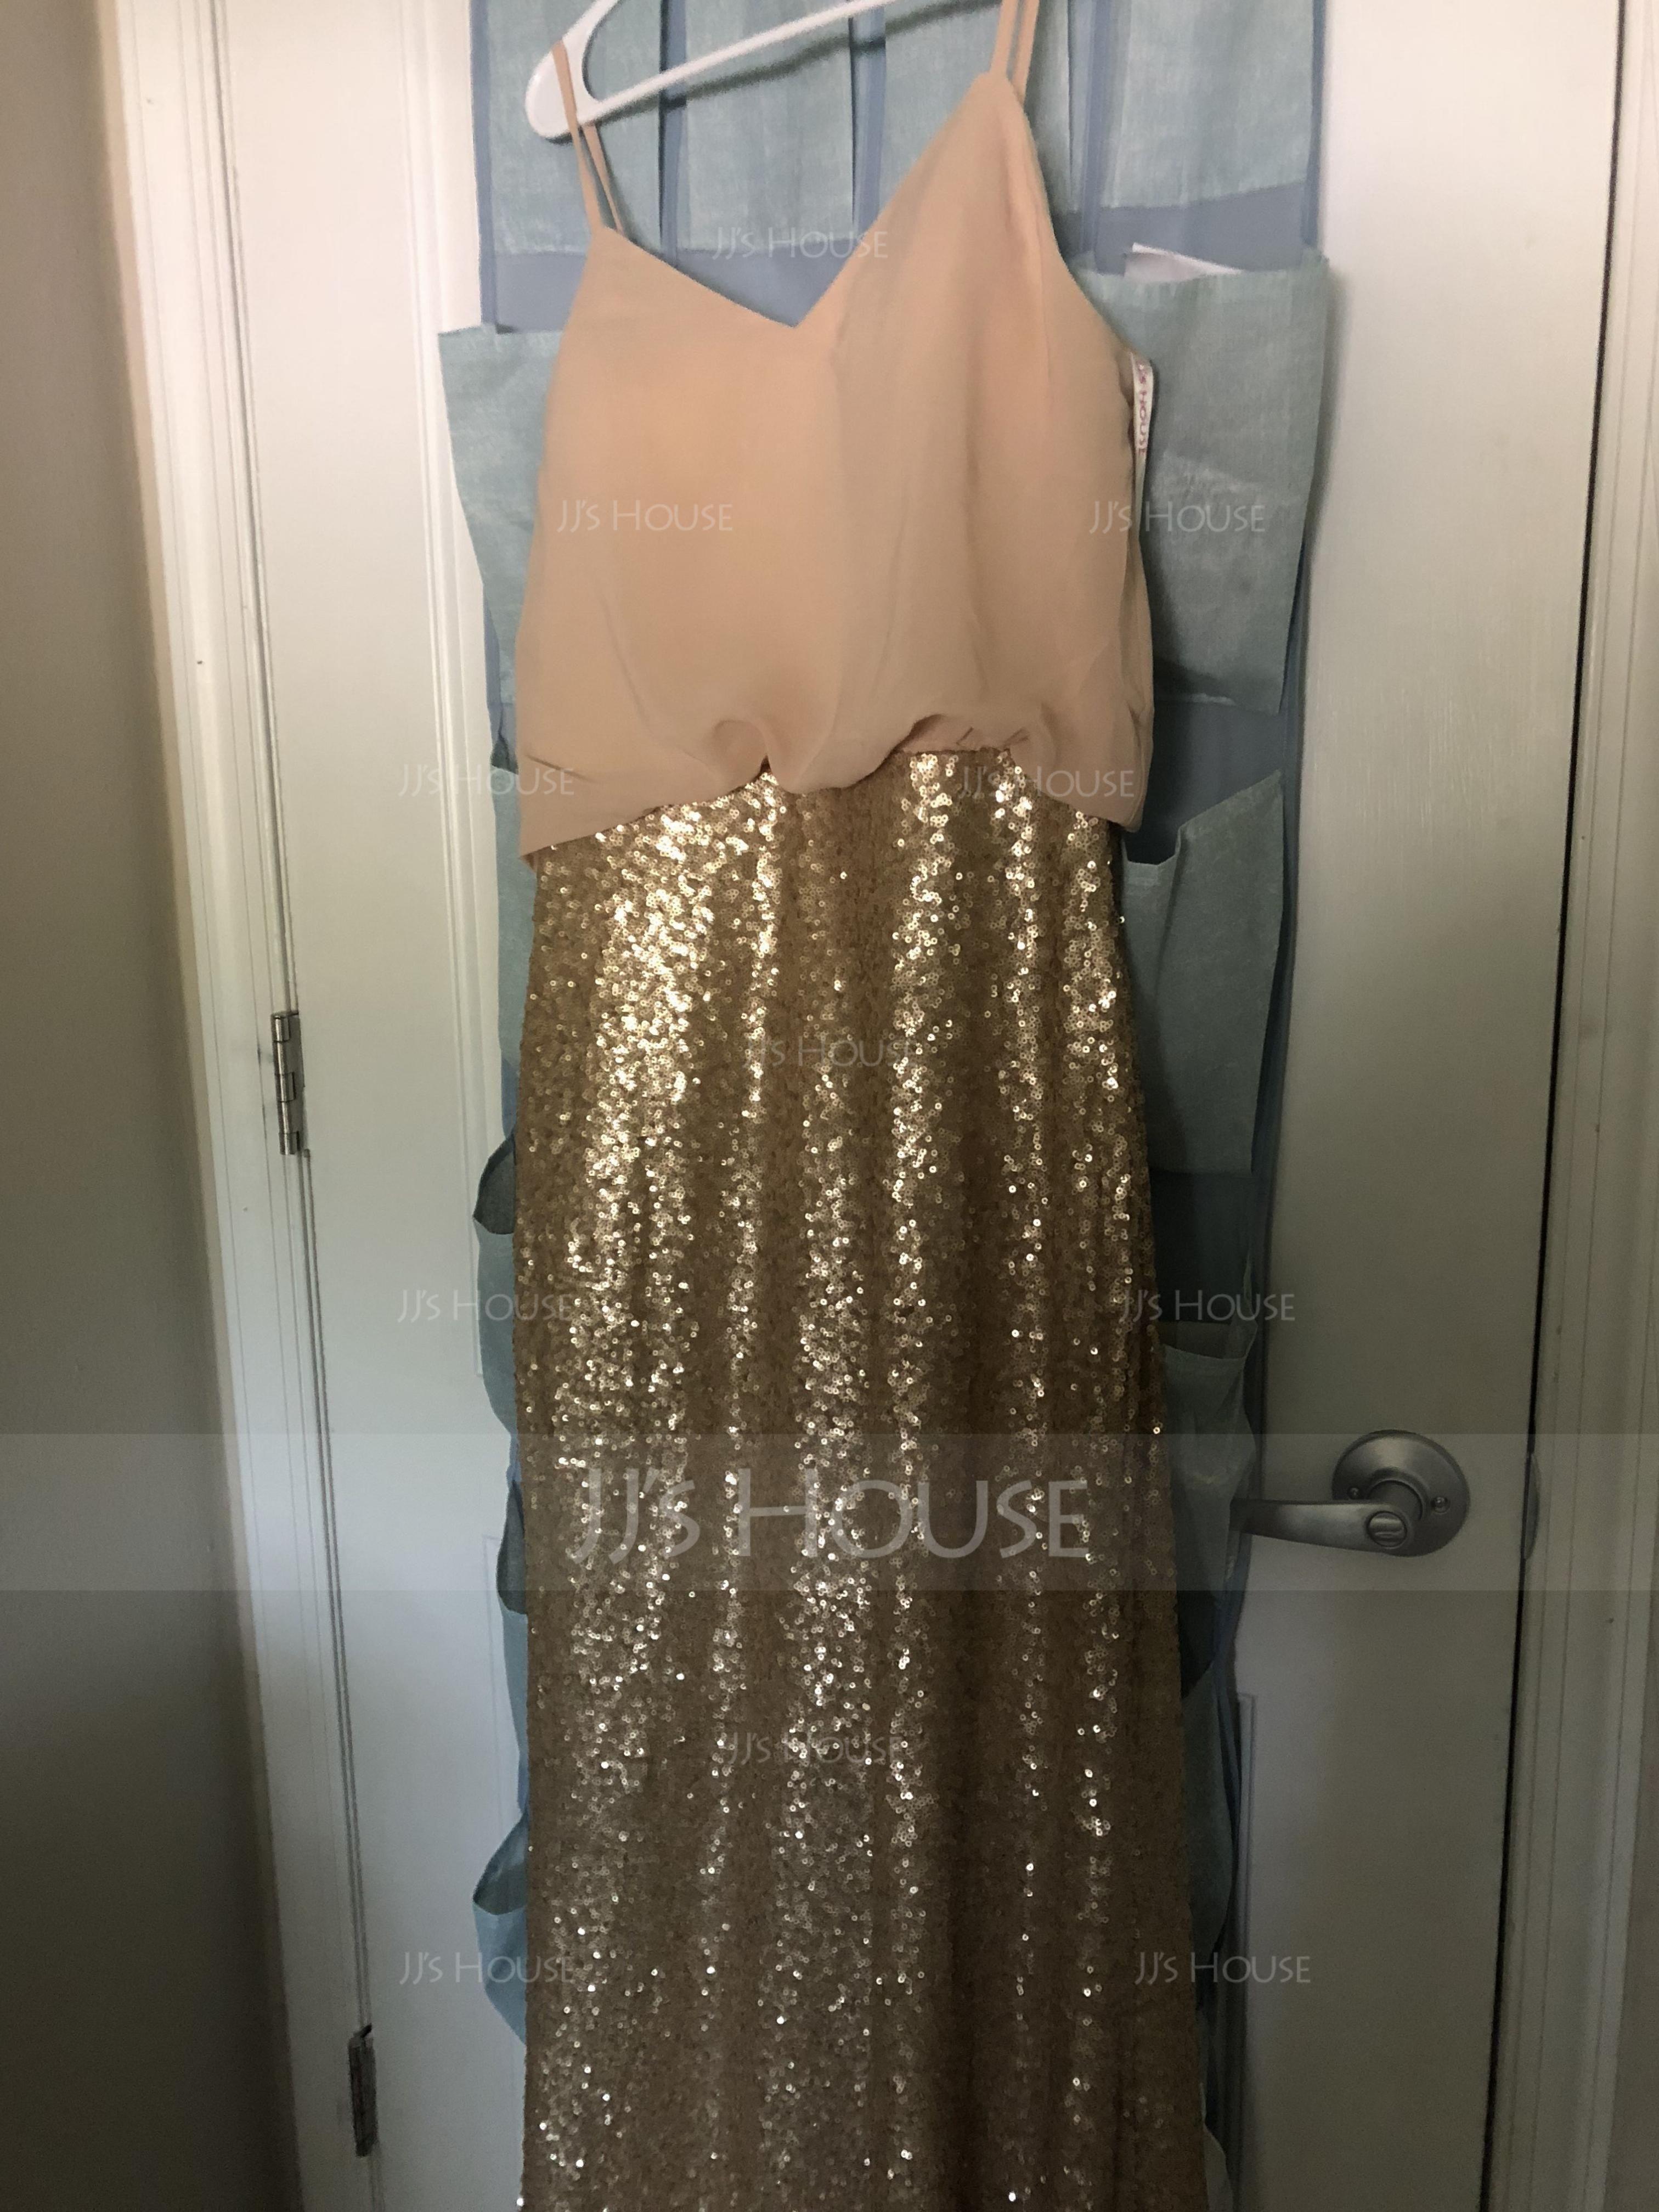 Sheath/Column V-neck Floor-Length Chiffon Sequined Bridesmaid Dress (266196026)